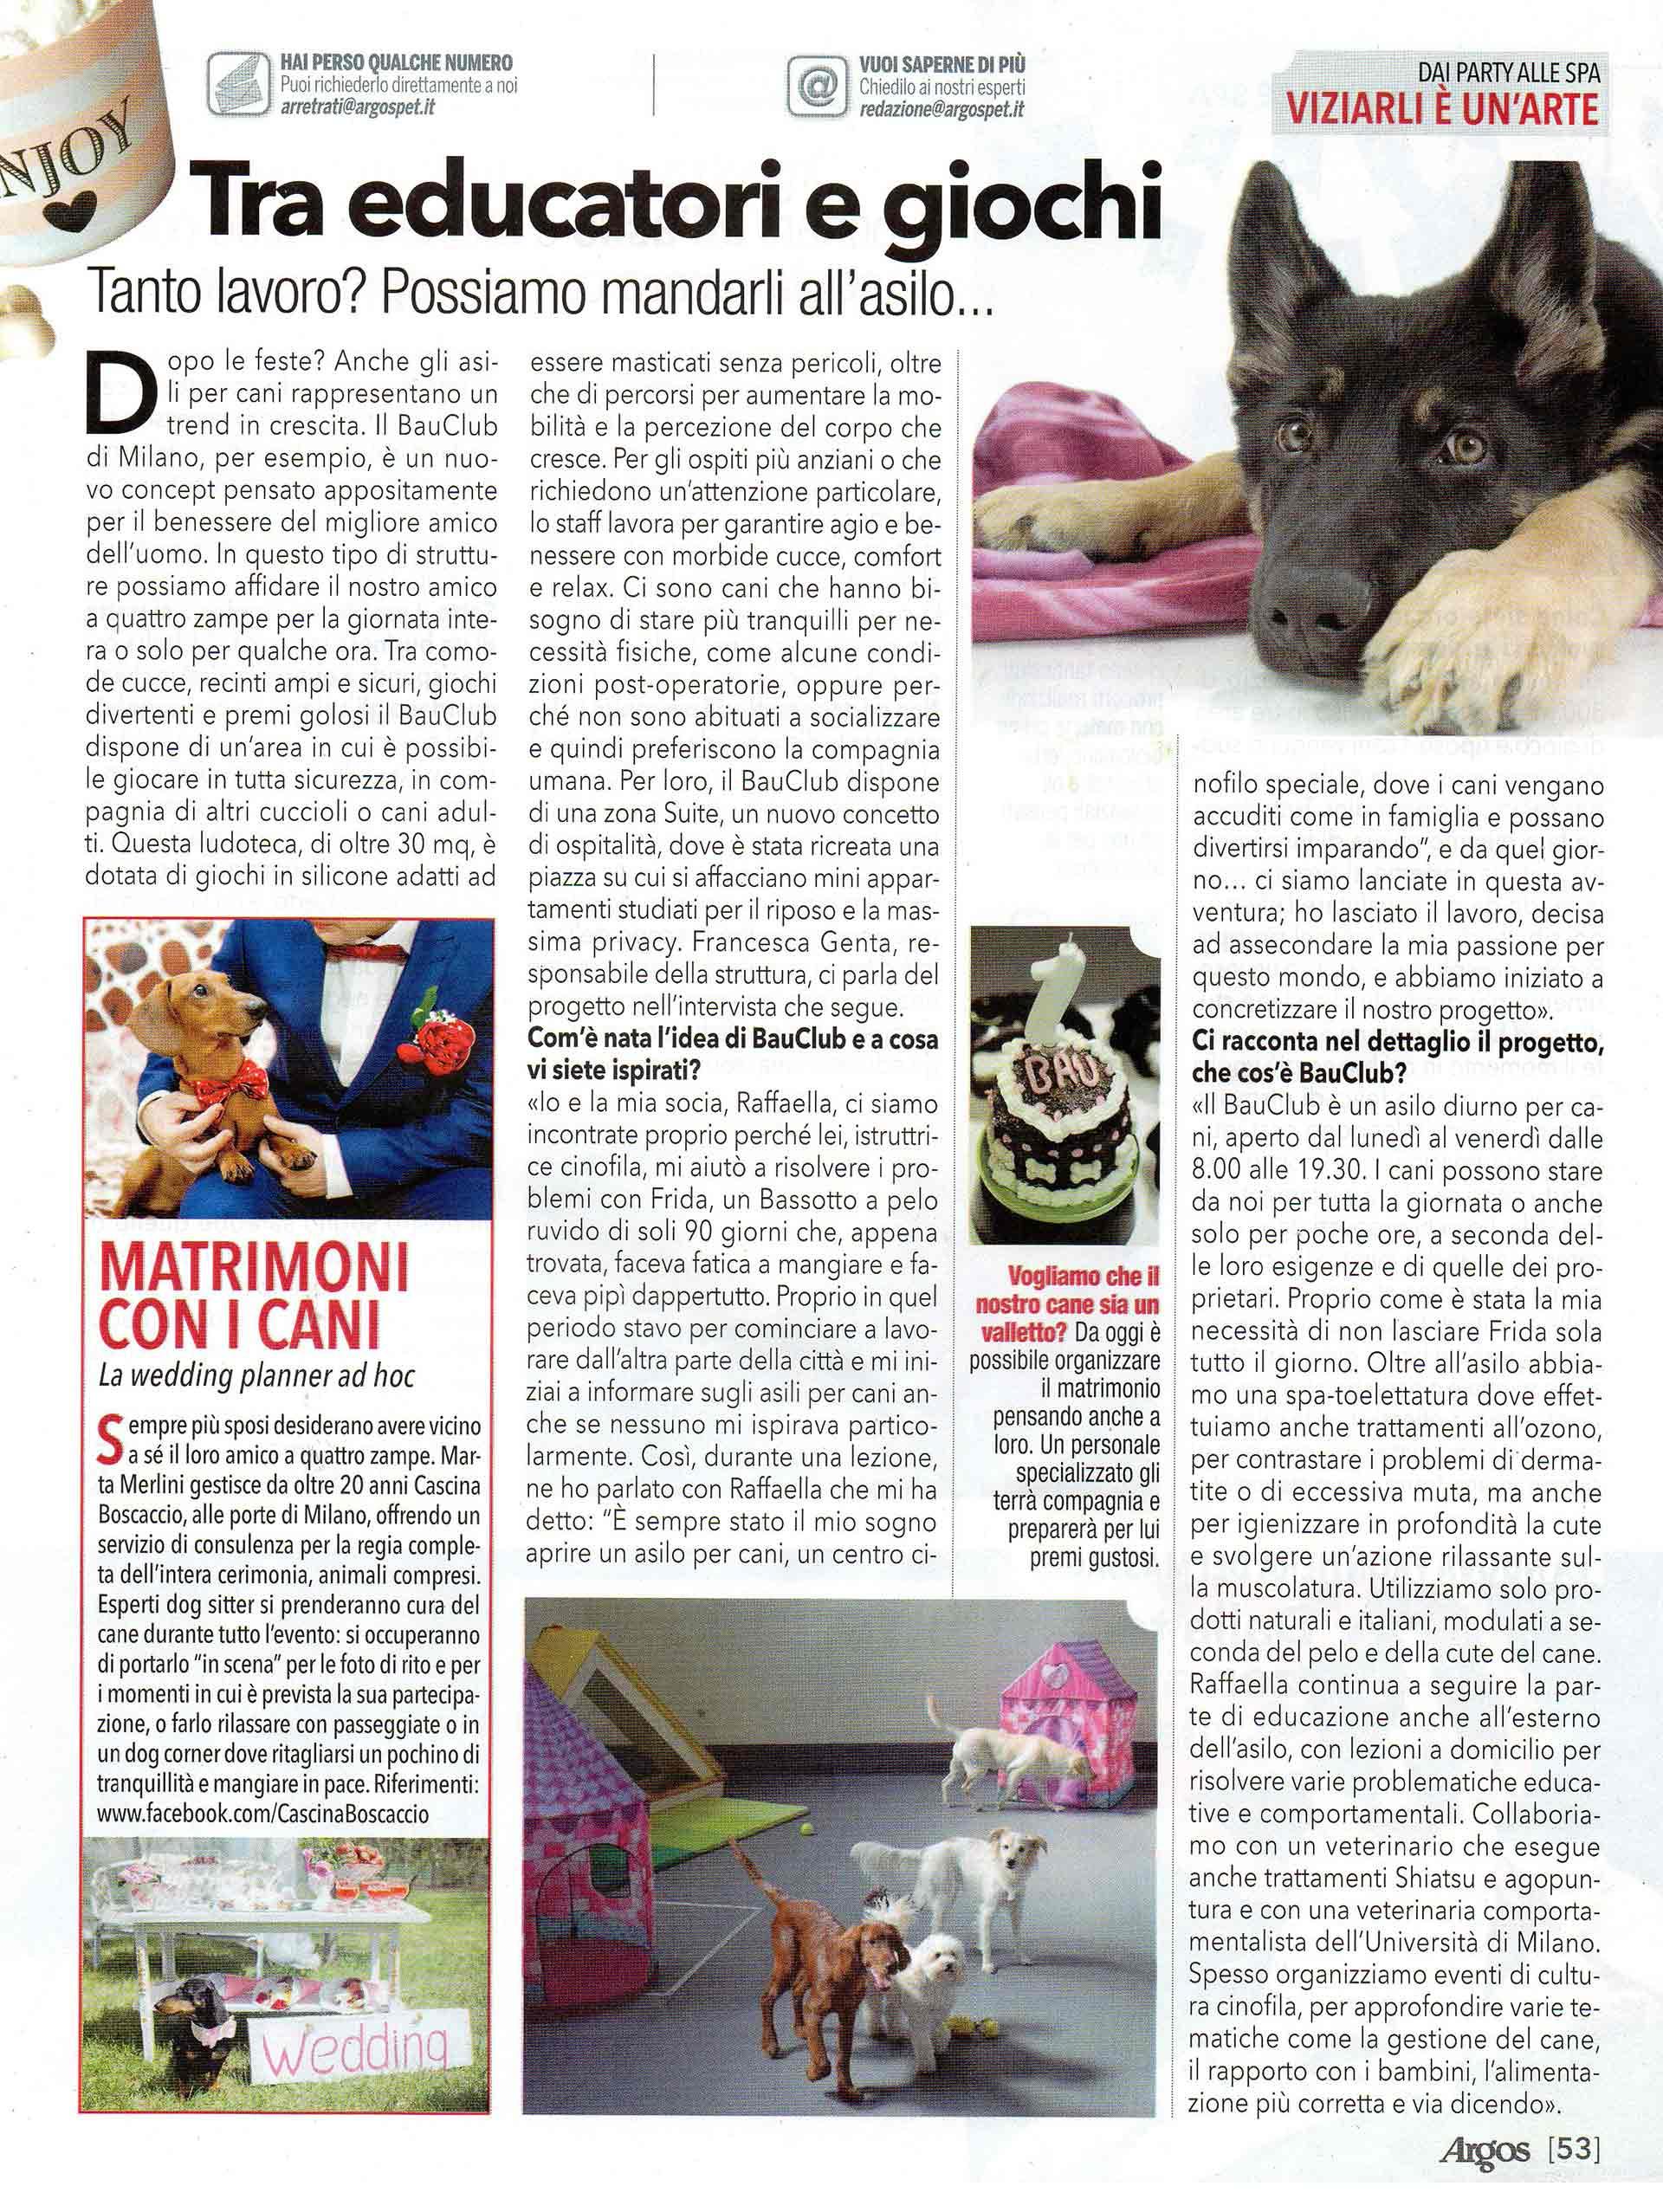 argos-rivista-bauclub-asilo-educazione-cani-milano-02